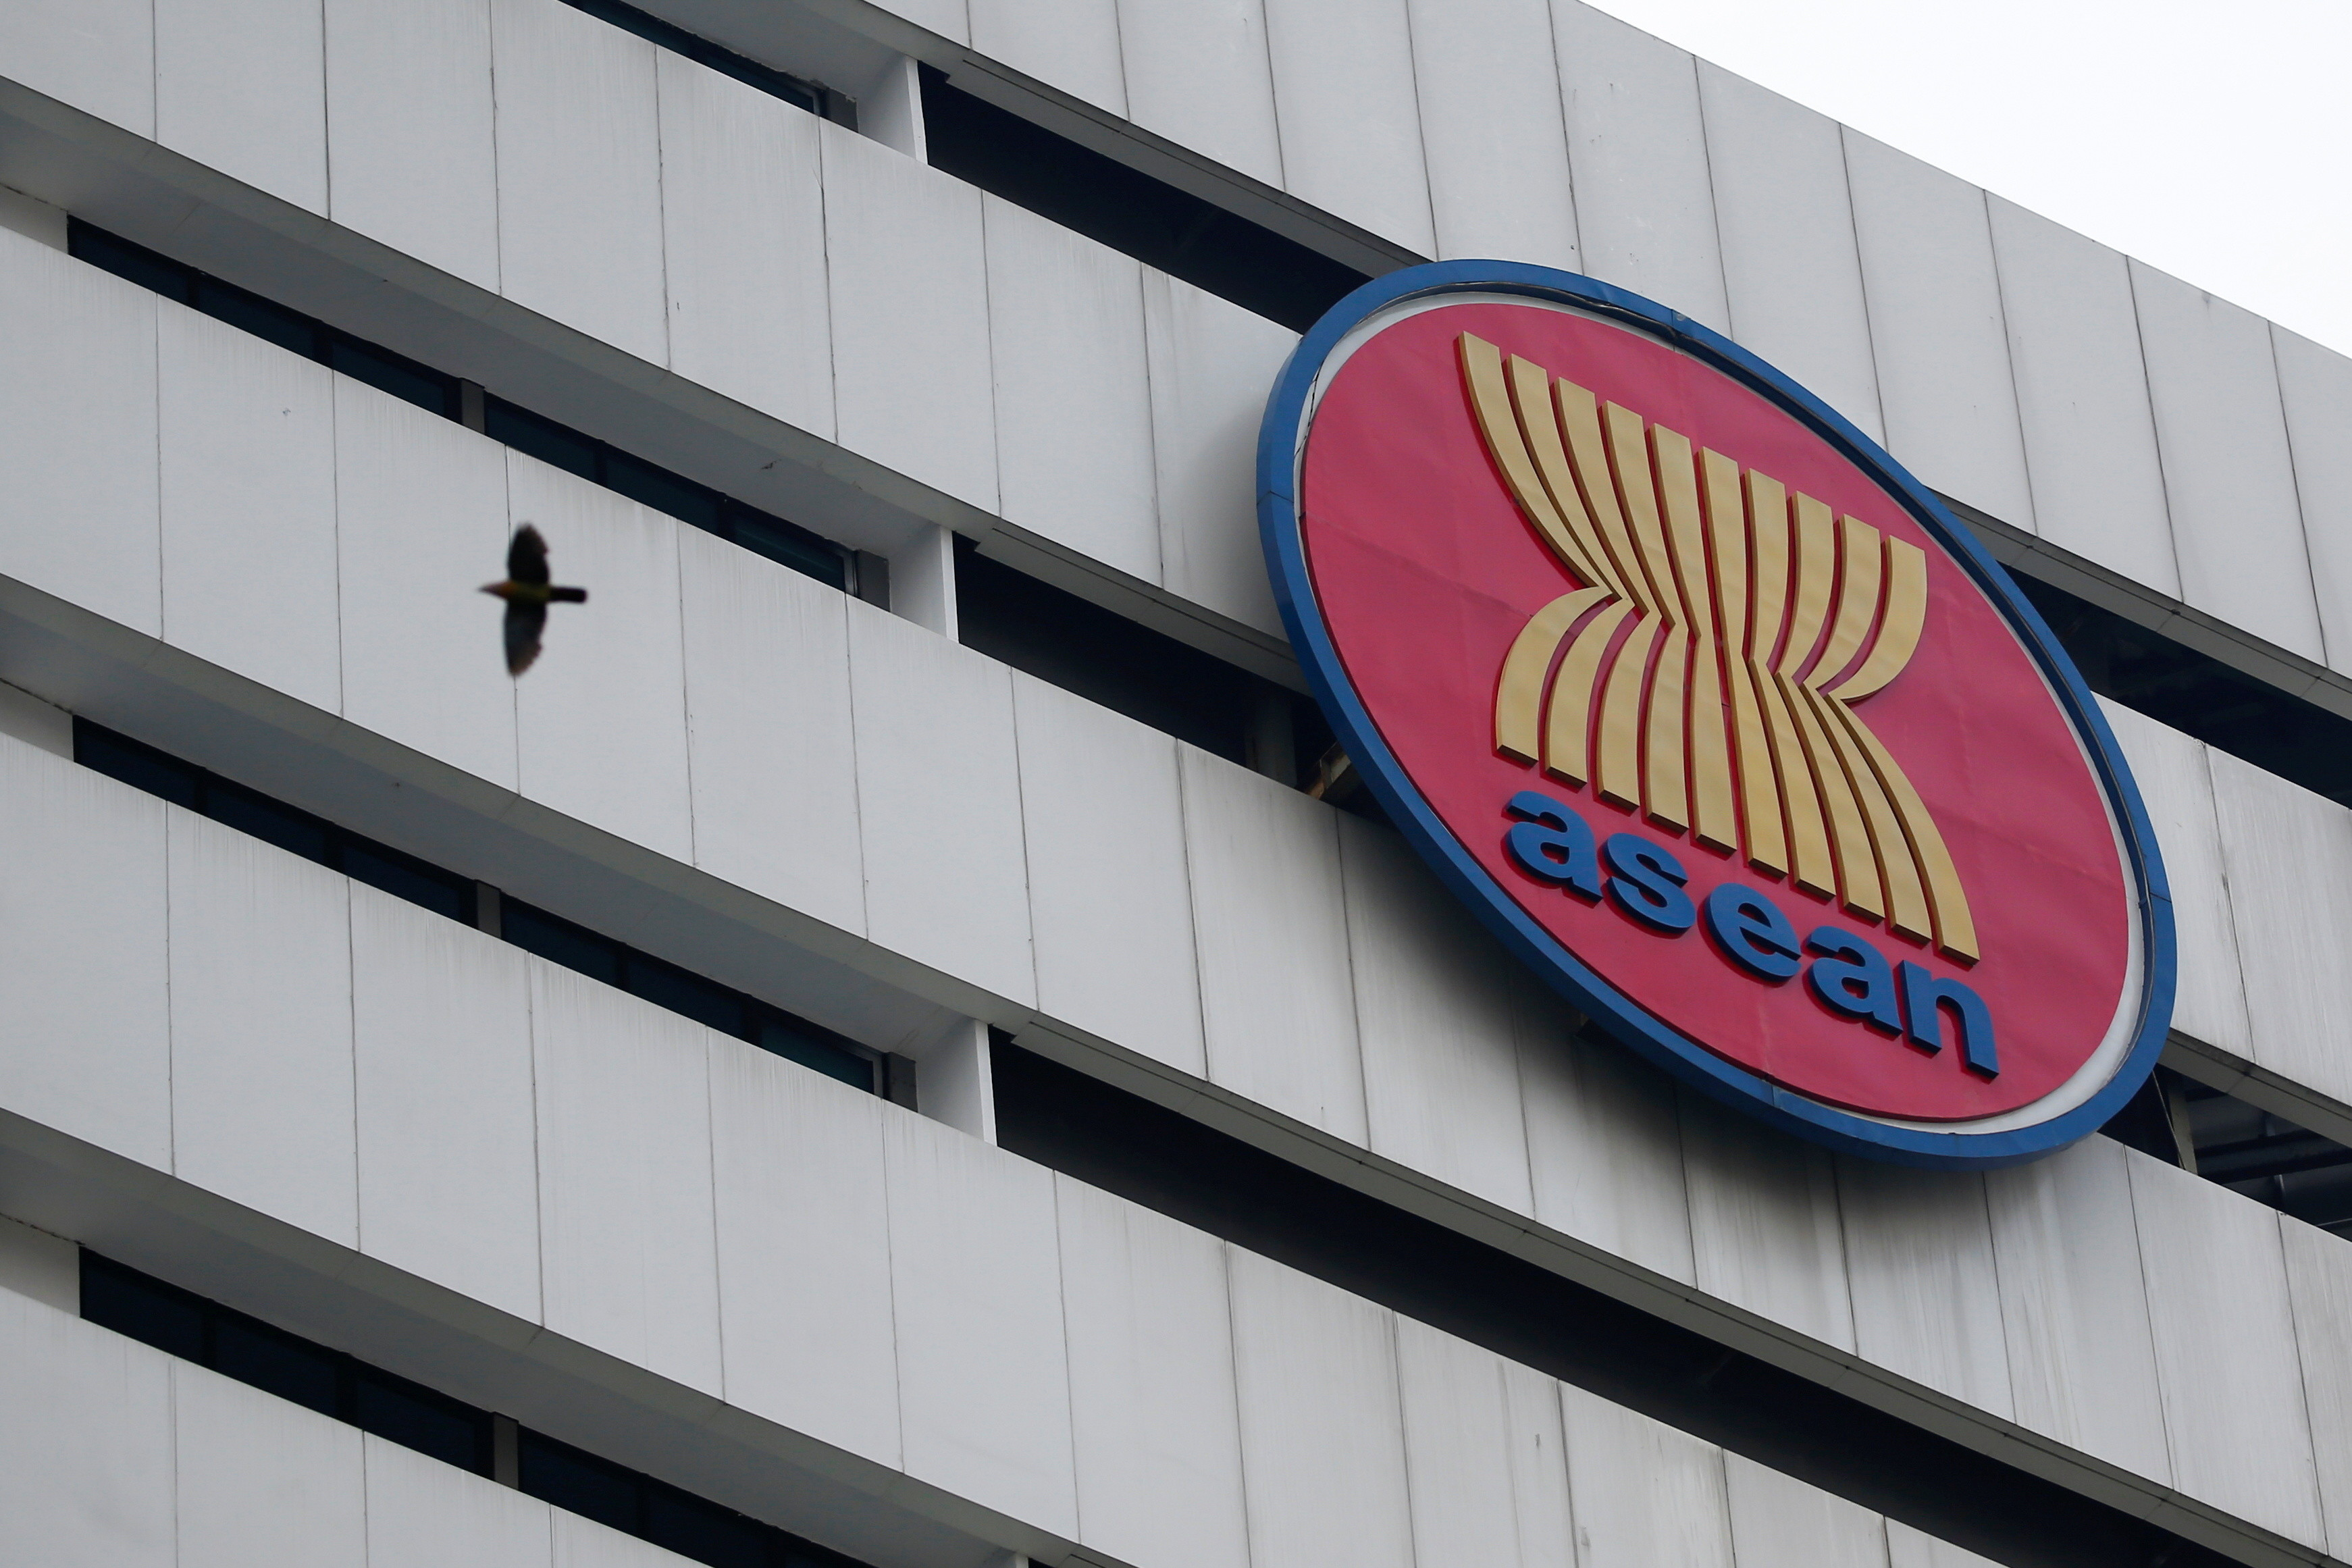 A bird flies near the Association of Southeast Asian Nations (ASEAN) secretariat building, ahead of the ASEAN leaders' meeting in Jakarta, Indonesia, April 23, 2021. REUTERS/Willy Kurniawan - RC2K1N9C16DM